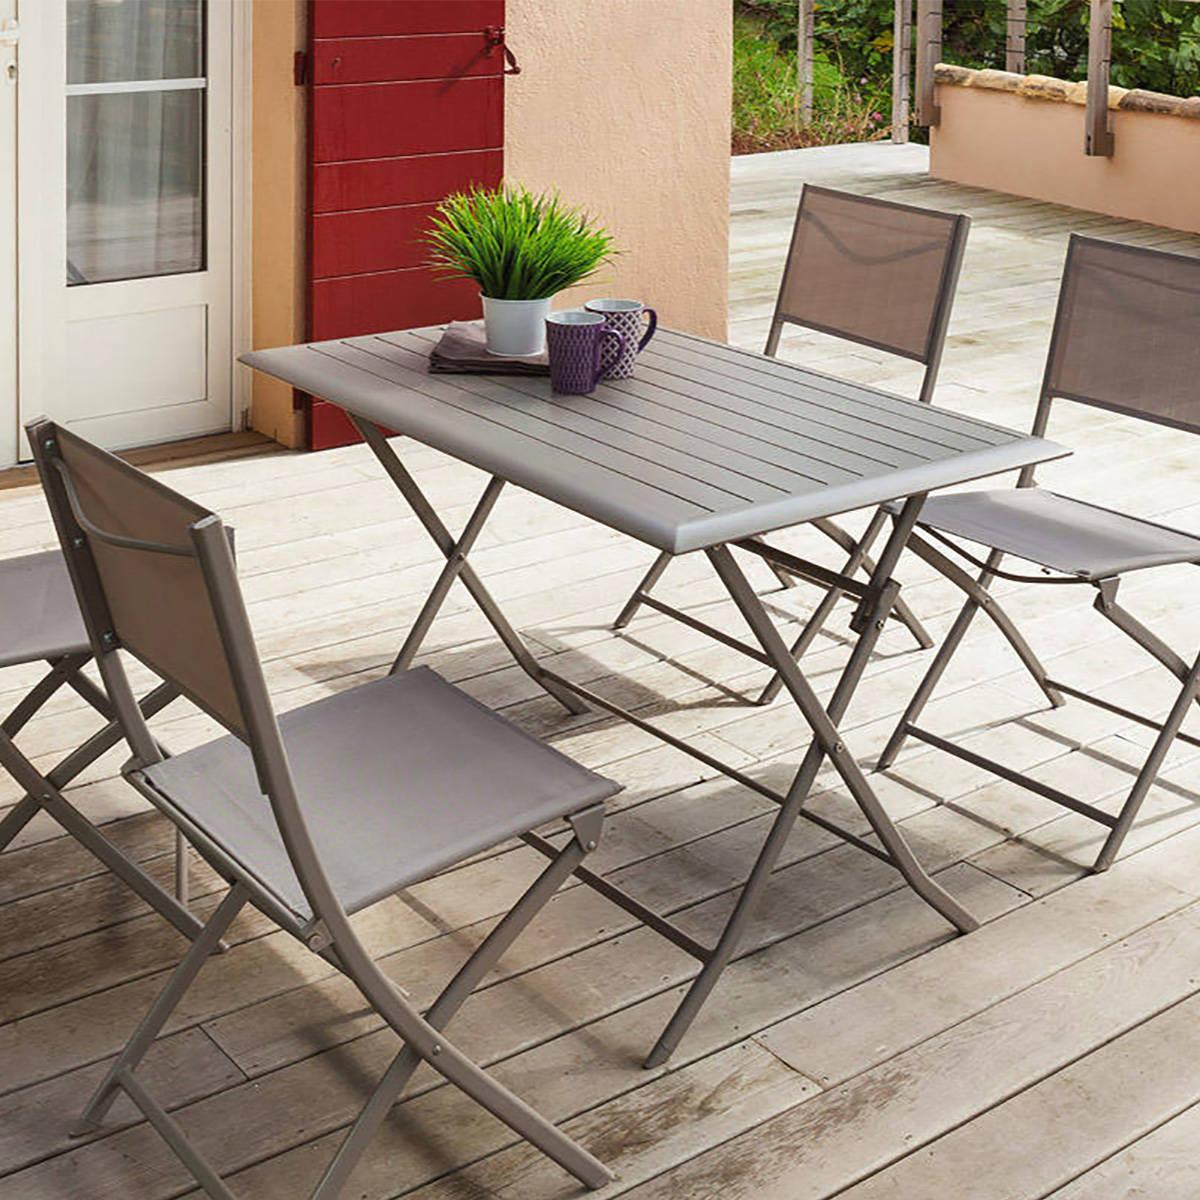 table de jardin pliante rectangulaire azua taupe 4 places aluminium traite epoxy hesperide taupe